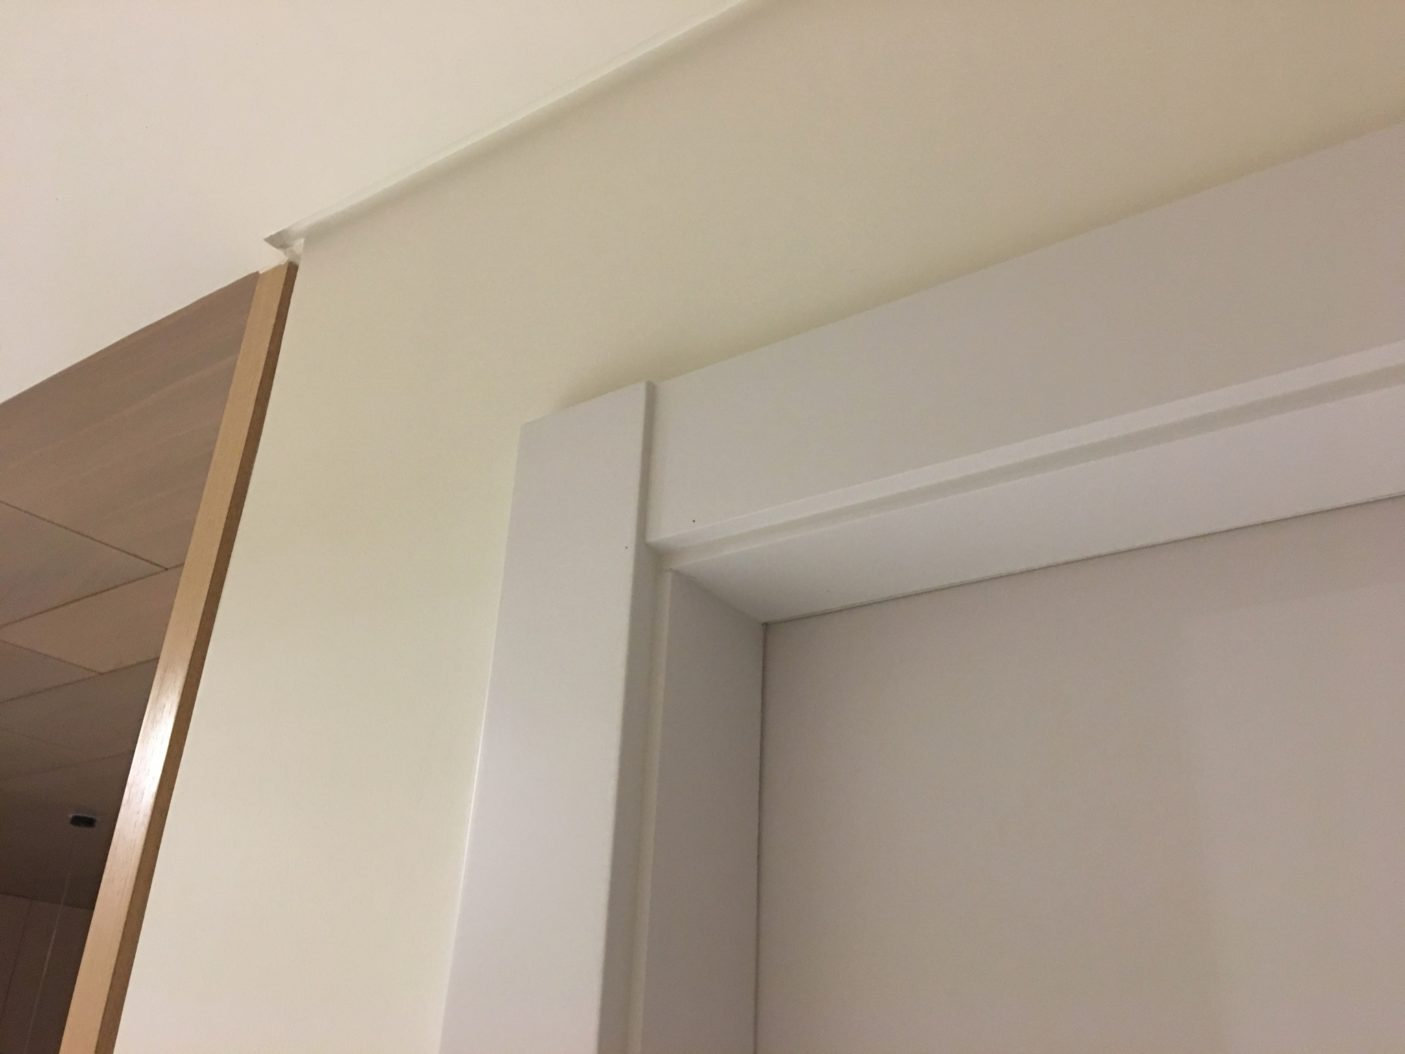 Panels-And-Doors-1.jpg